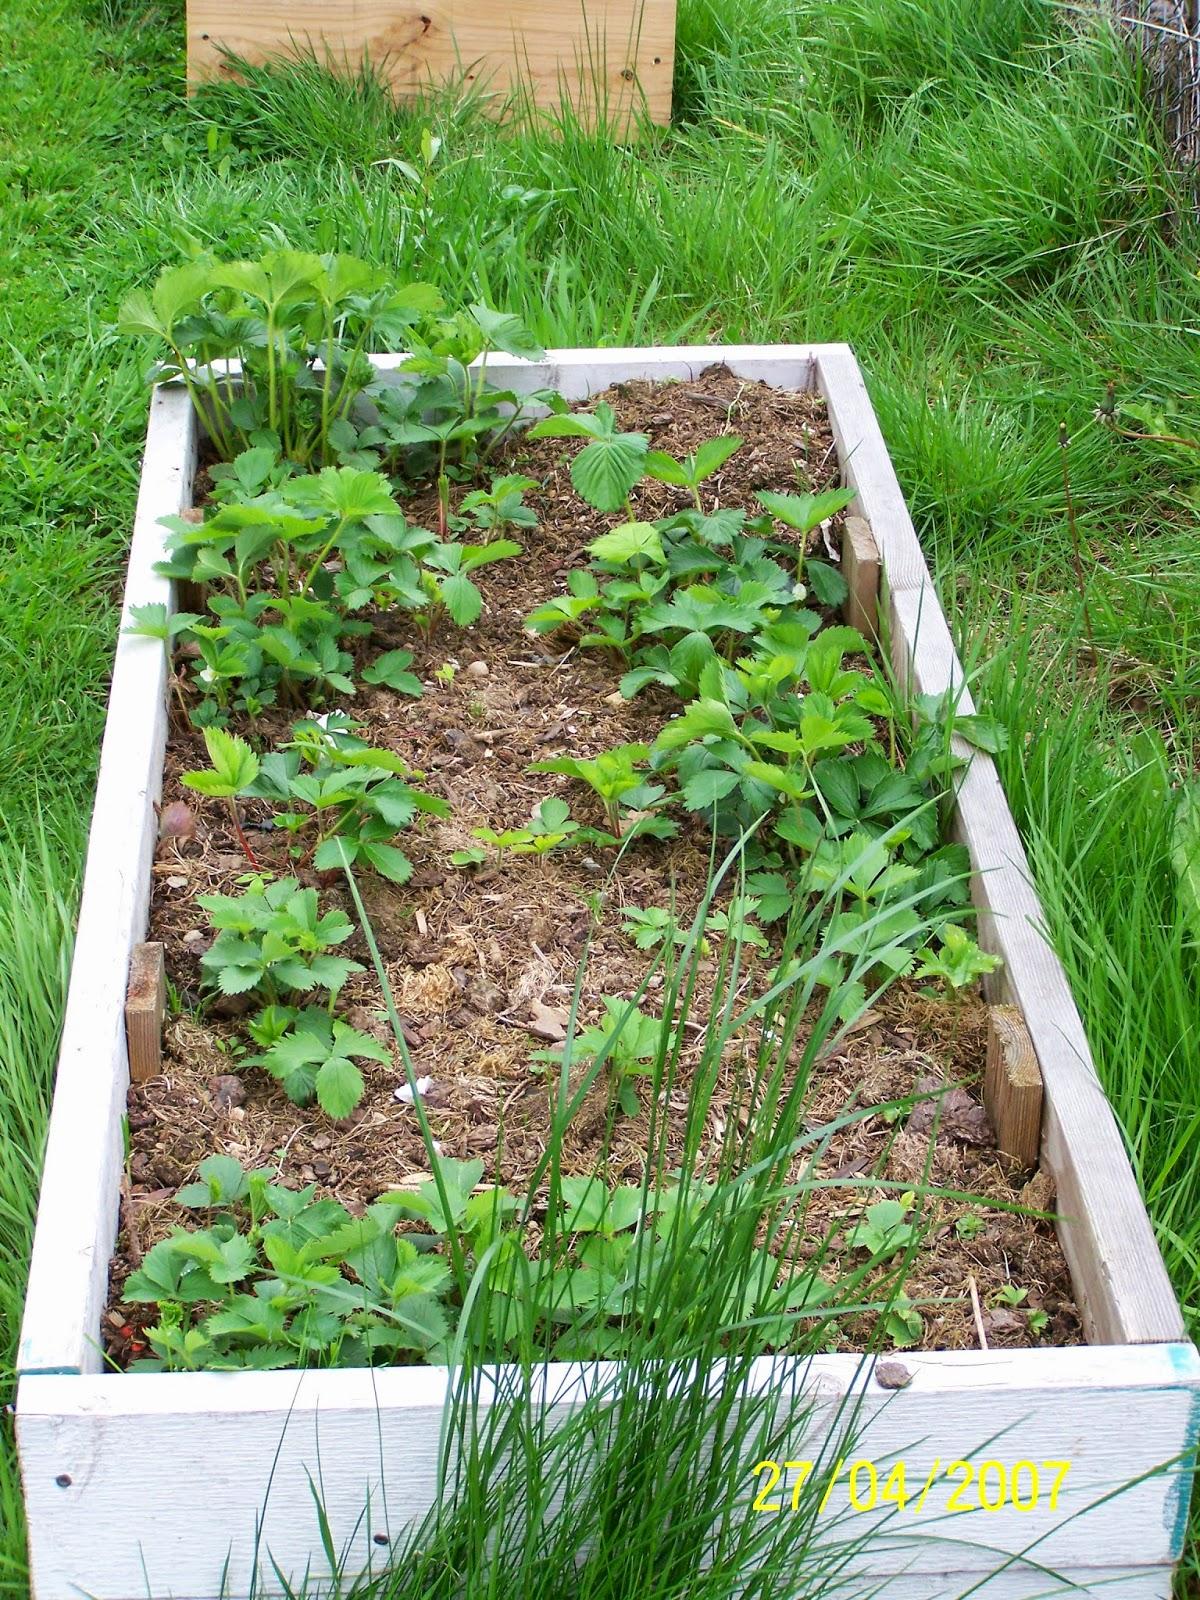 Square Foot Gardening Strawberry Box 1 Copyright Adrienne Z. Milligan